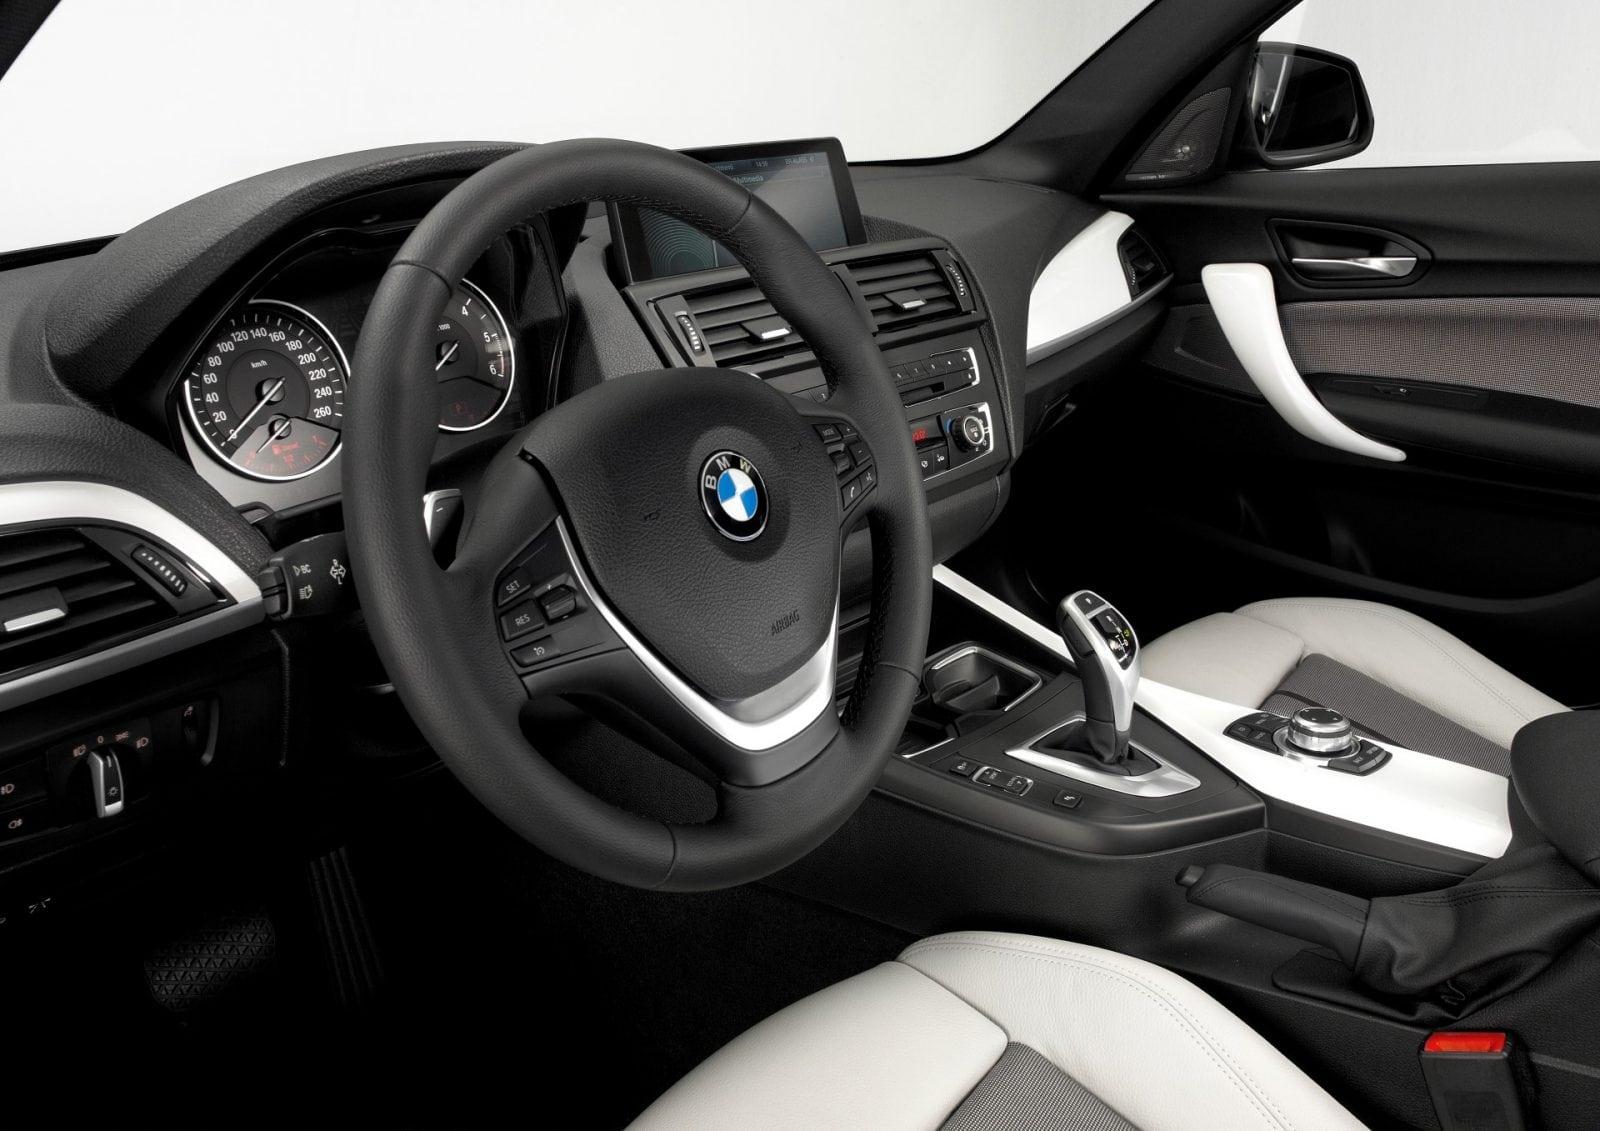 BMW 1 Series F20 Urban Line 2011 Interior